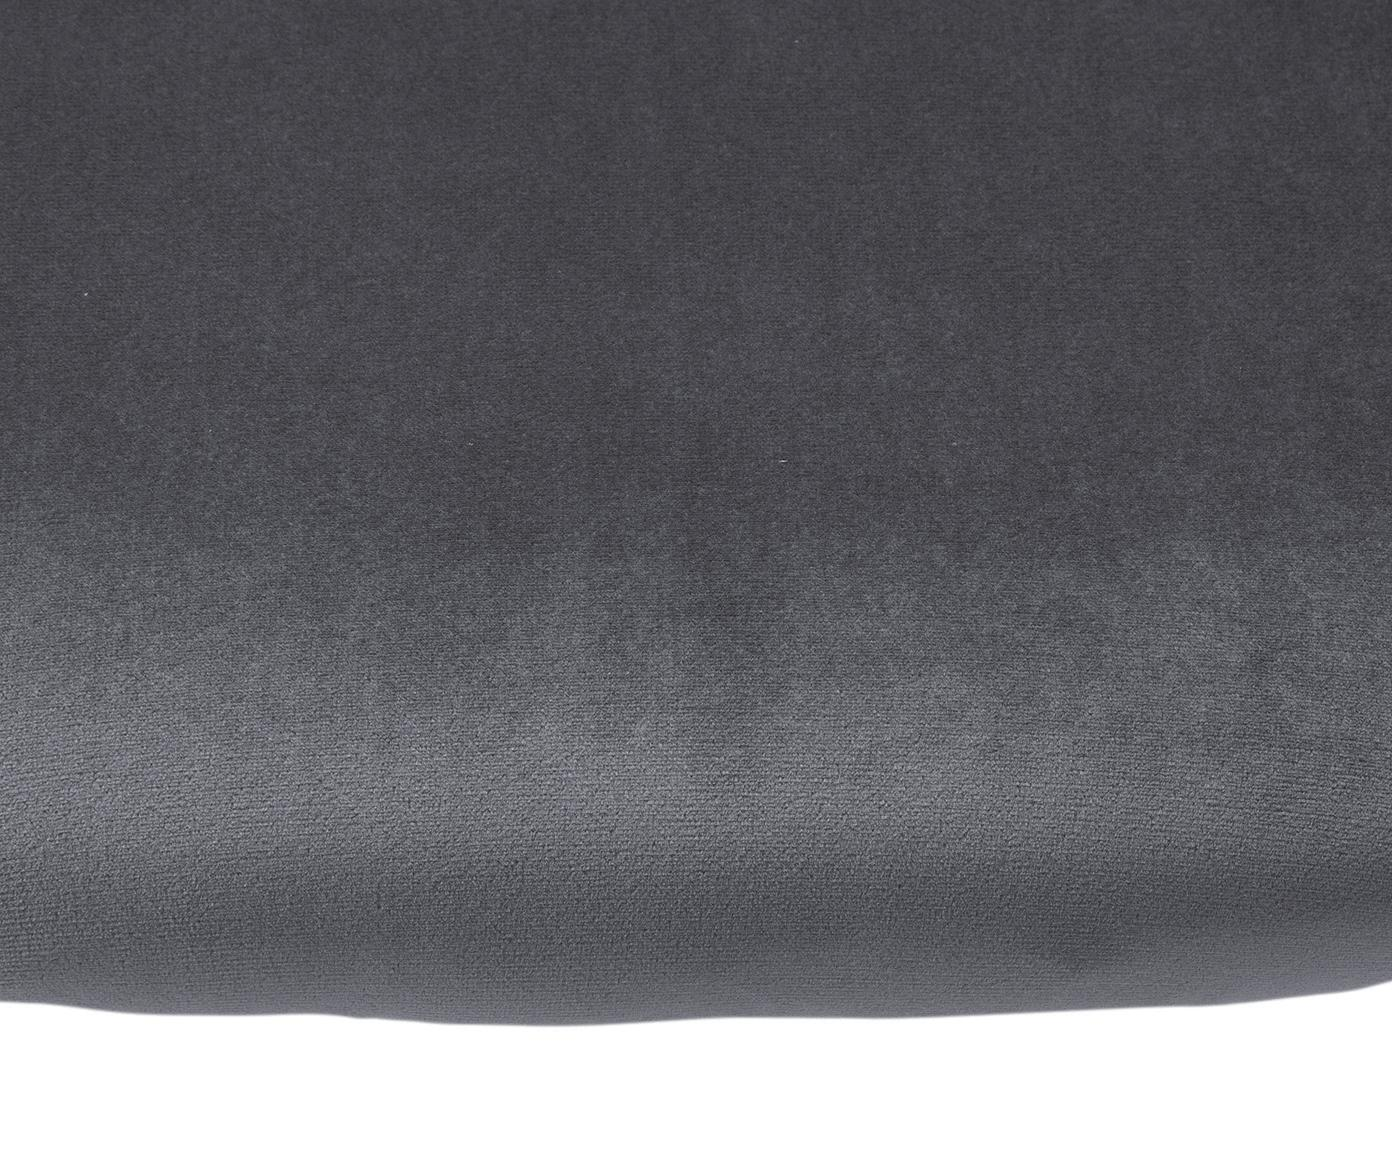 Sedia imbottita in velluto Yoki 2 pz, Rivestimento: velluto (poliestere) 20.0, Gambe: metallo verniciato a polv, Rivestimento: grigio Gambe: nero opaco, Larg. 53 x Prof. 57 cm